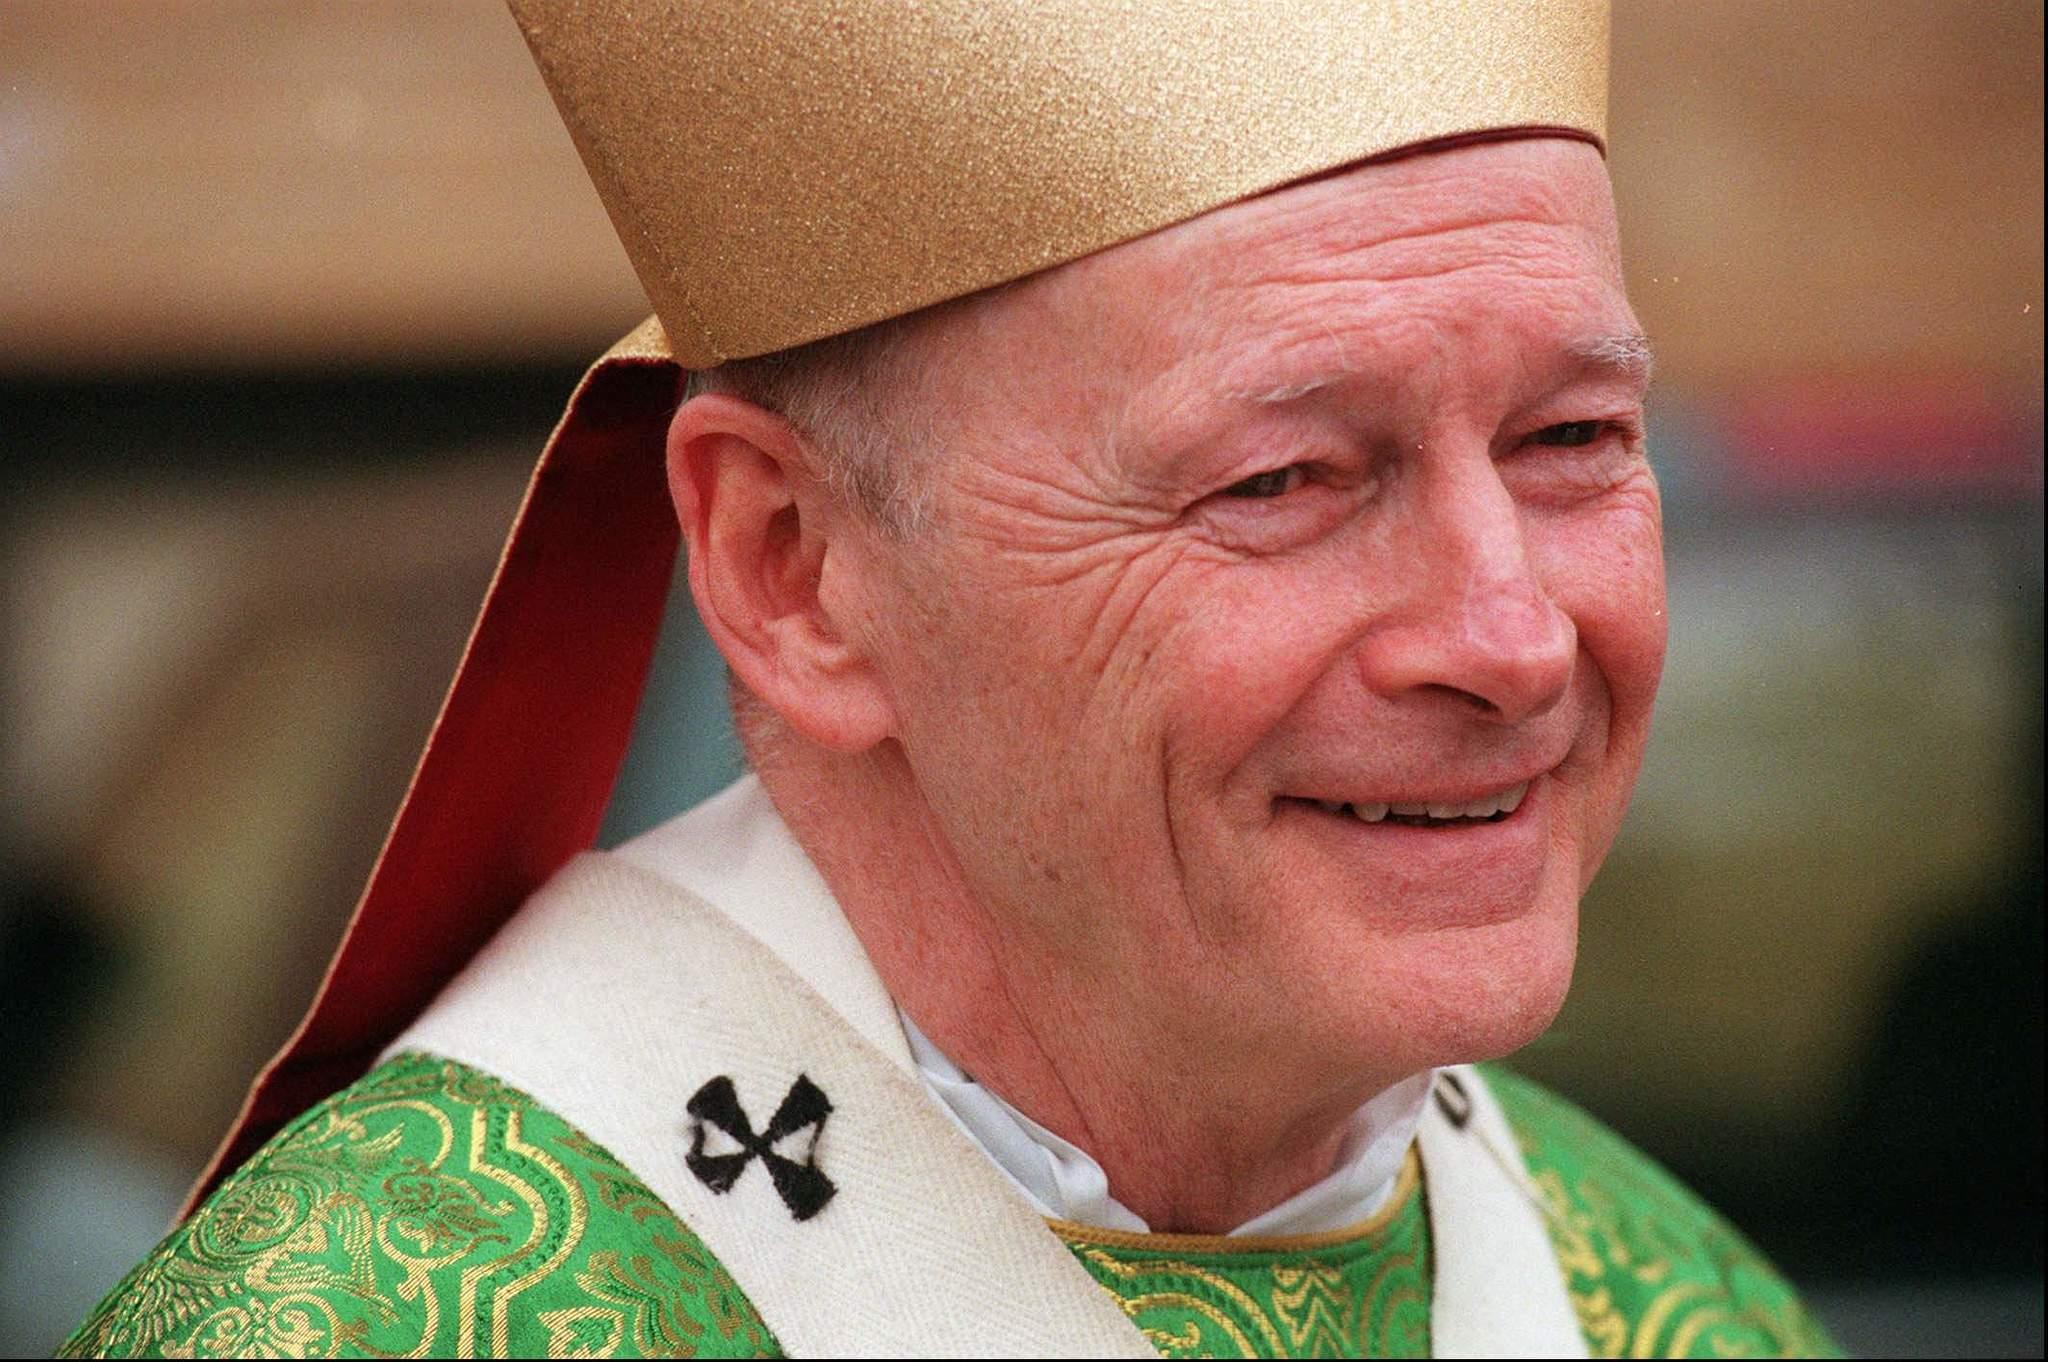 Resultado de imagen para Cardinal McCarrick